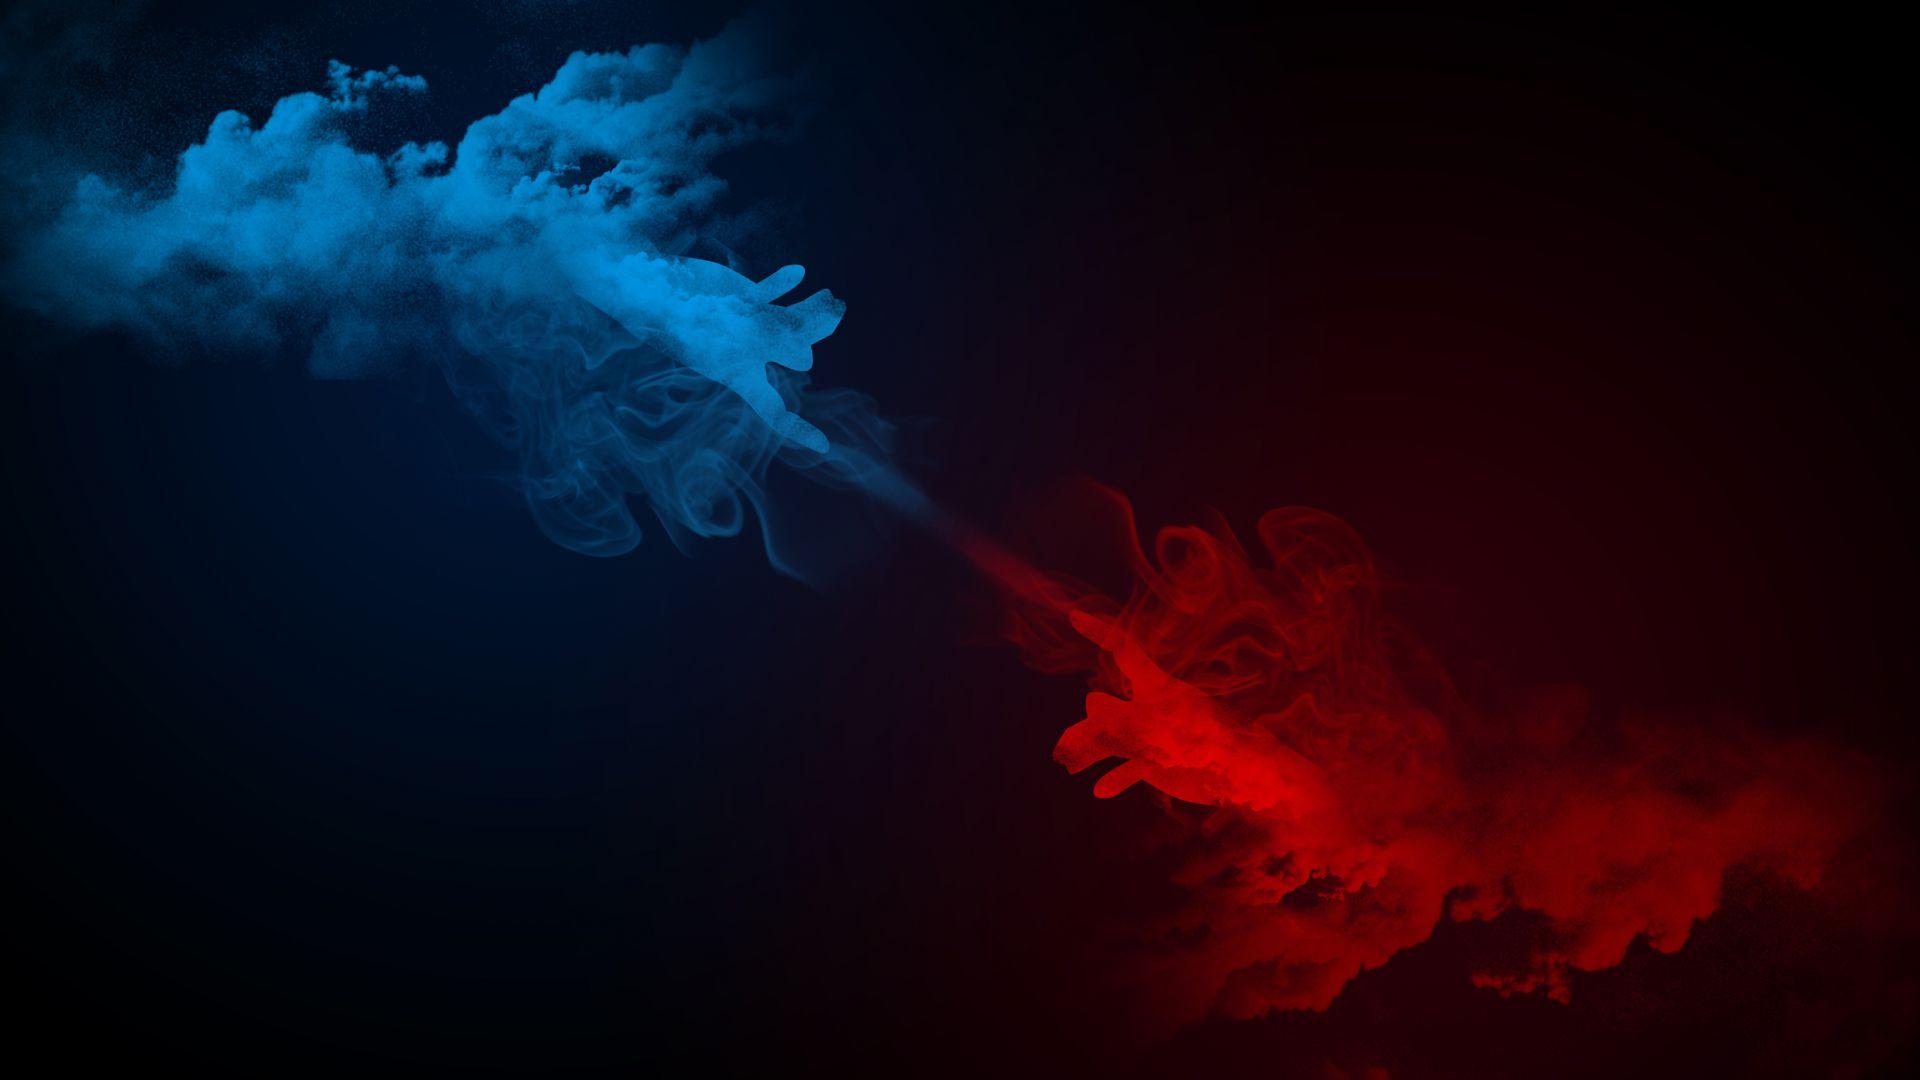 Desktop Wallpaper Smoke, Hands, Digital Art, Abstract, 5k